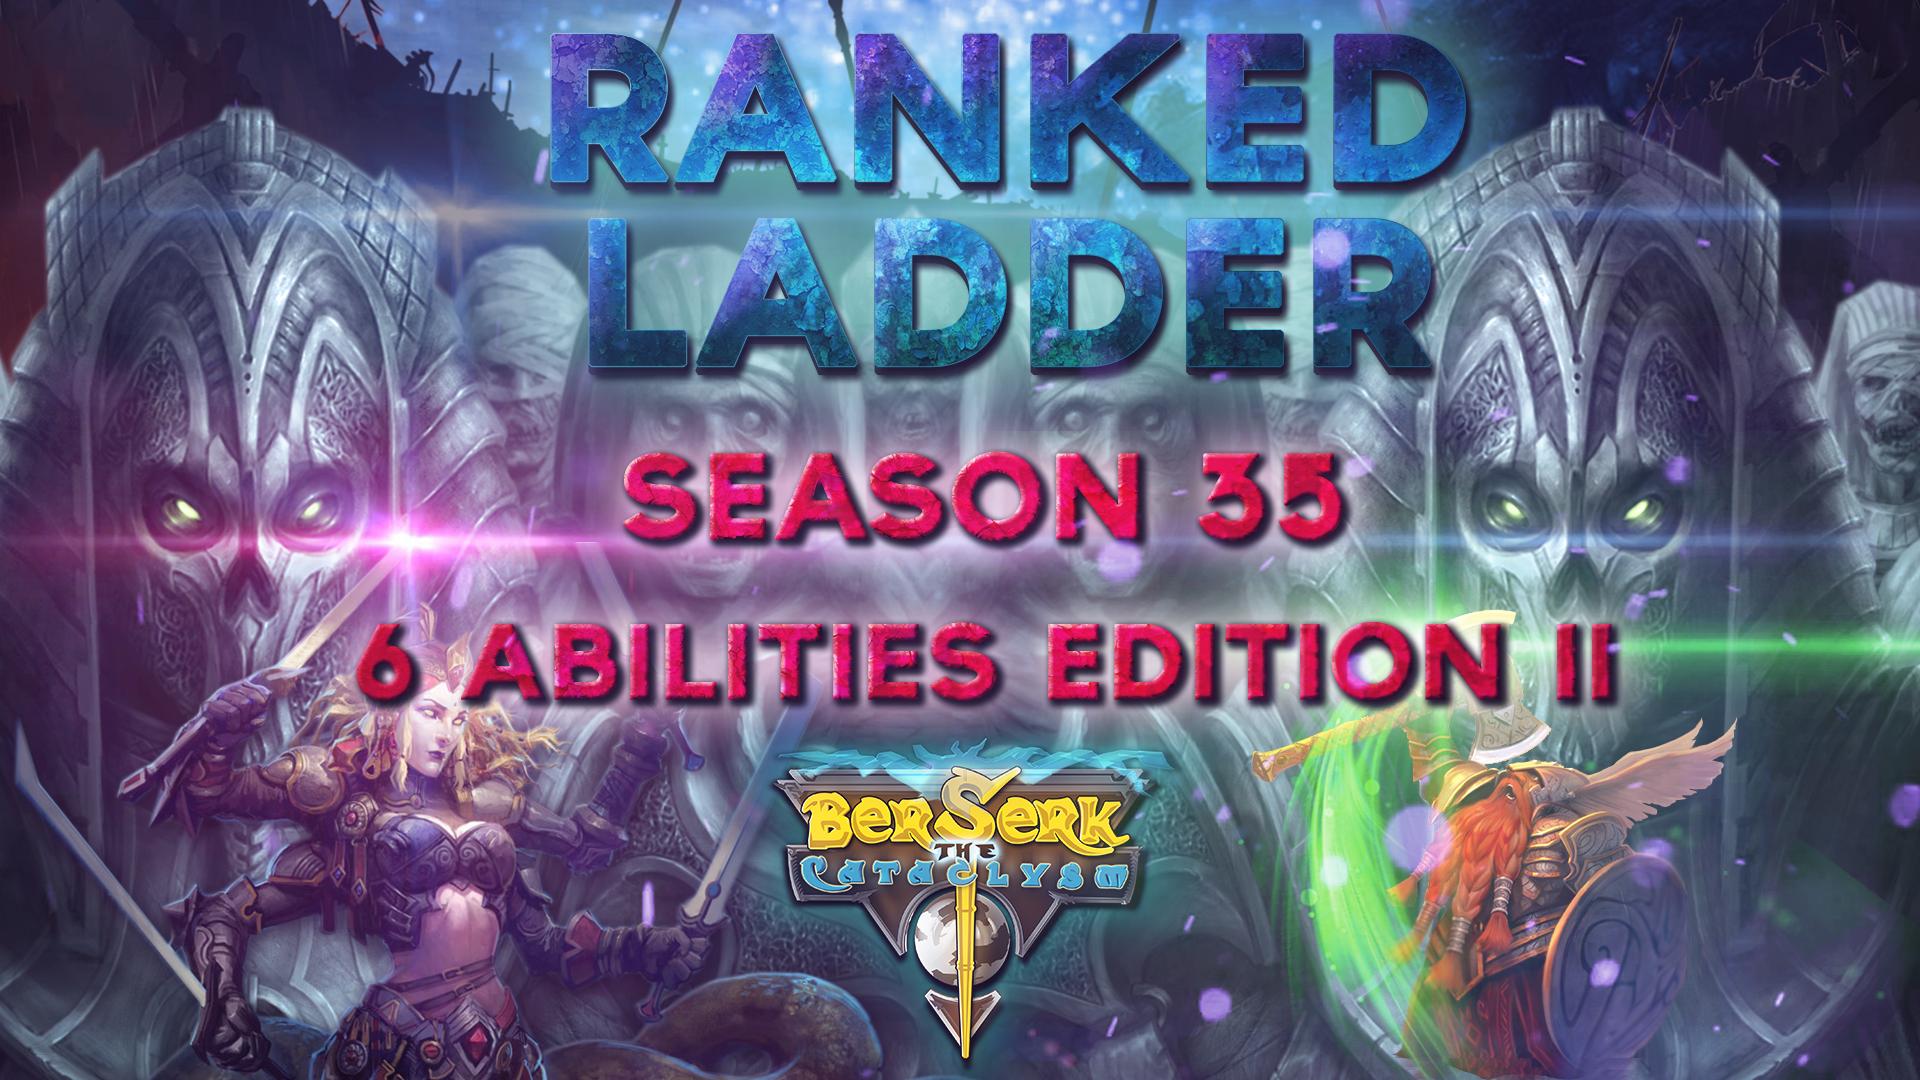 Ranked_LAdder_Season_35.jpg